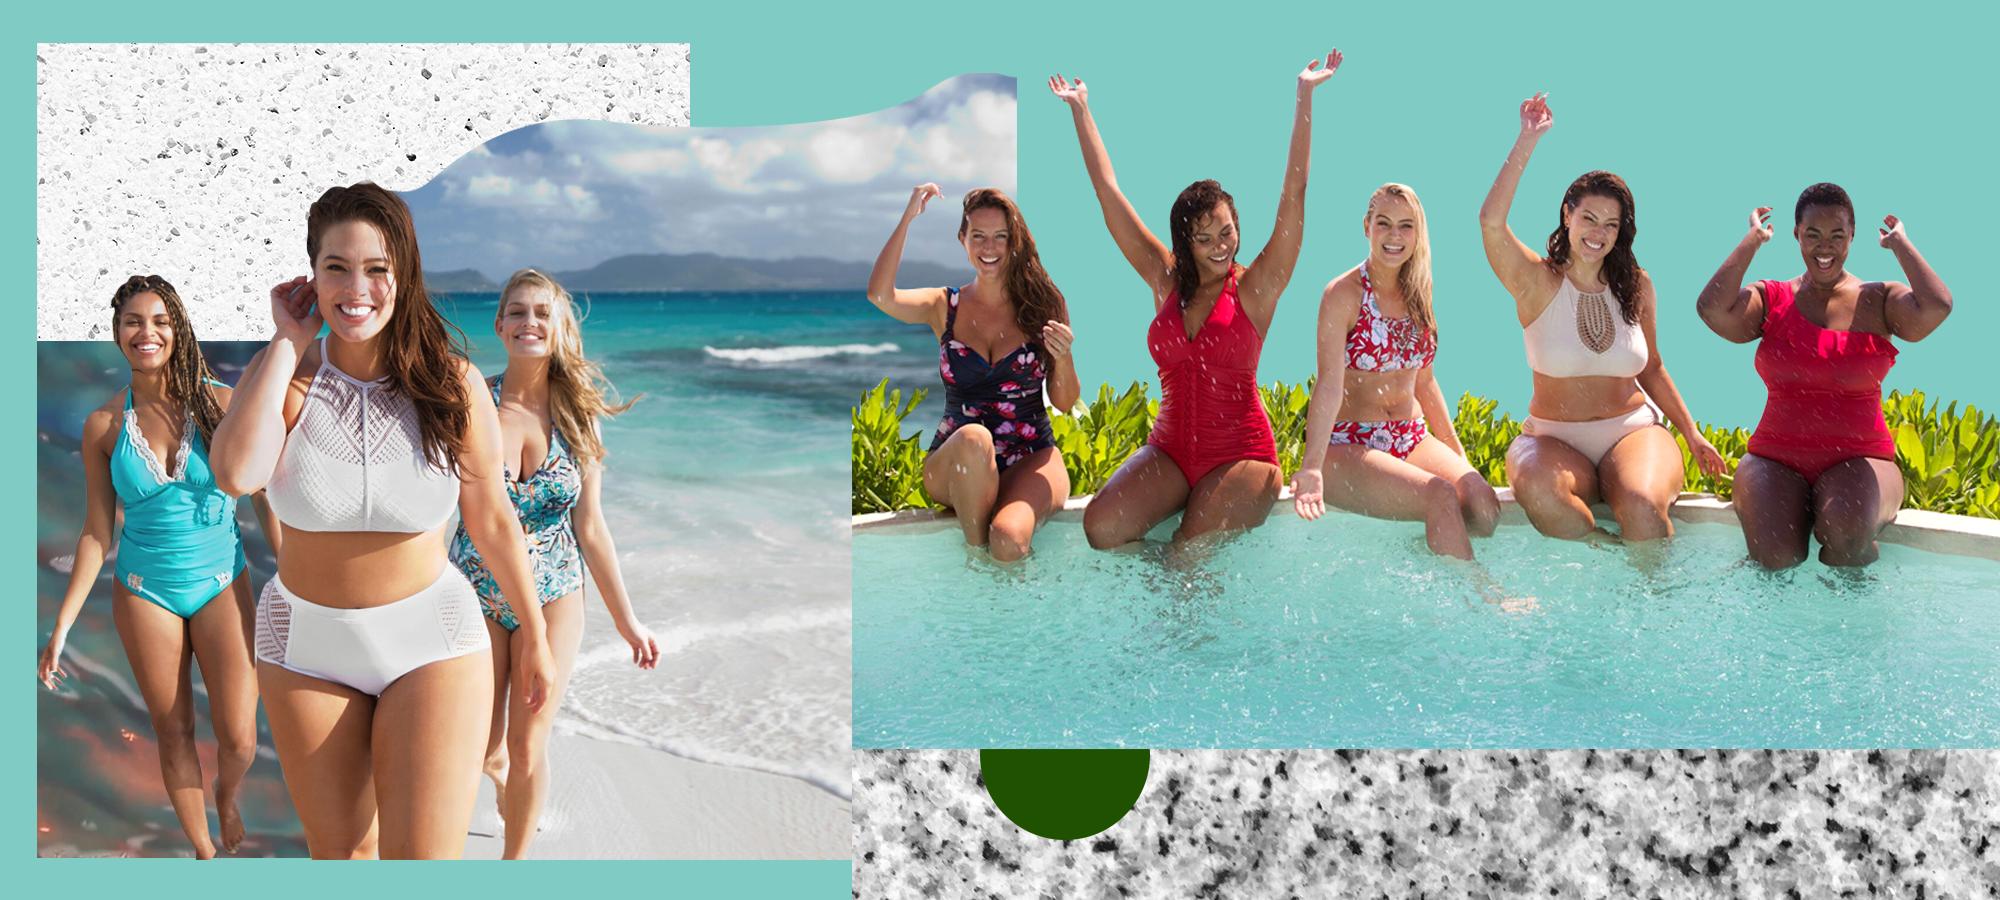 c722764711f4e Ashley Graham Plus Size Fashion Swimsuits For All